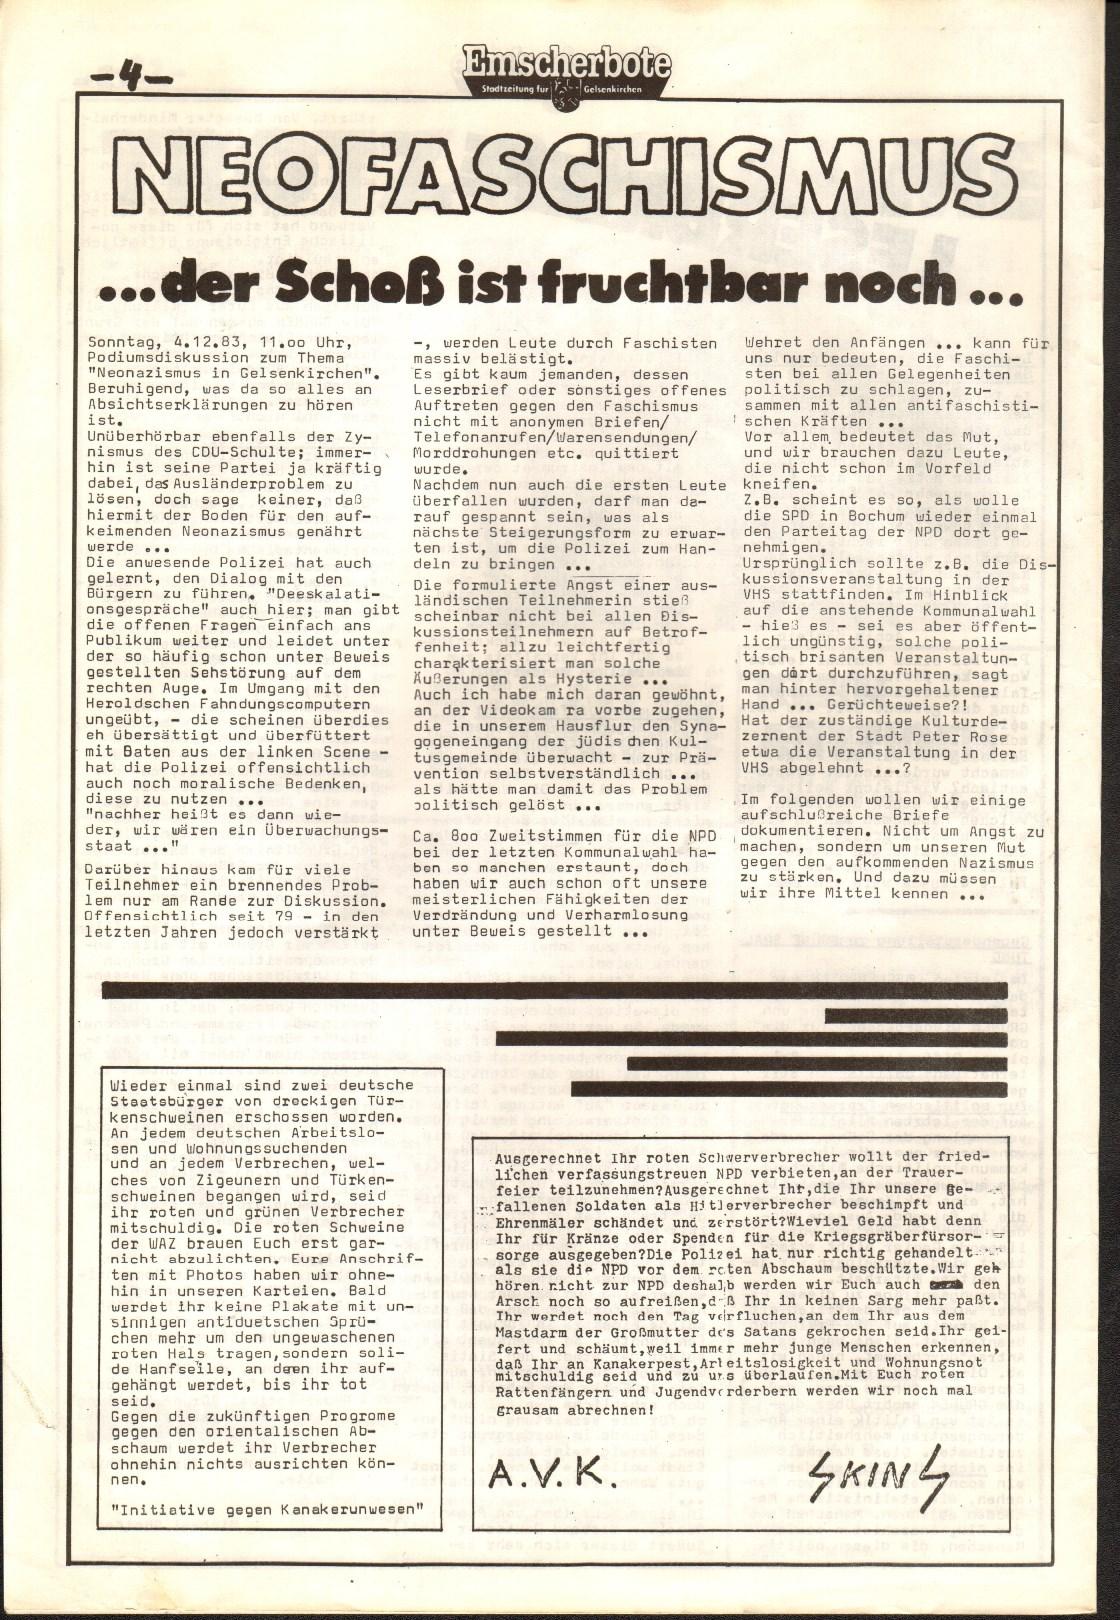 Gelsenkirchen_Emscherbote_1984_35_04